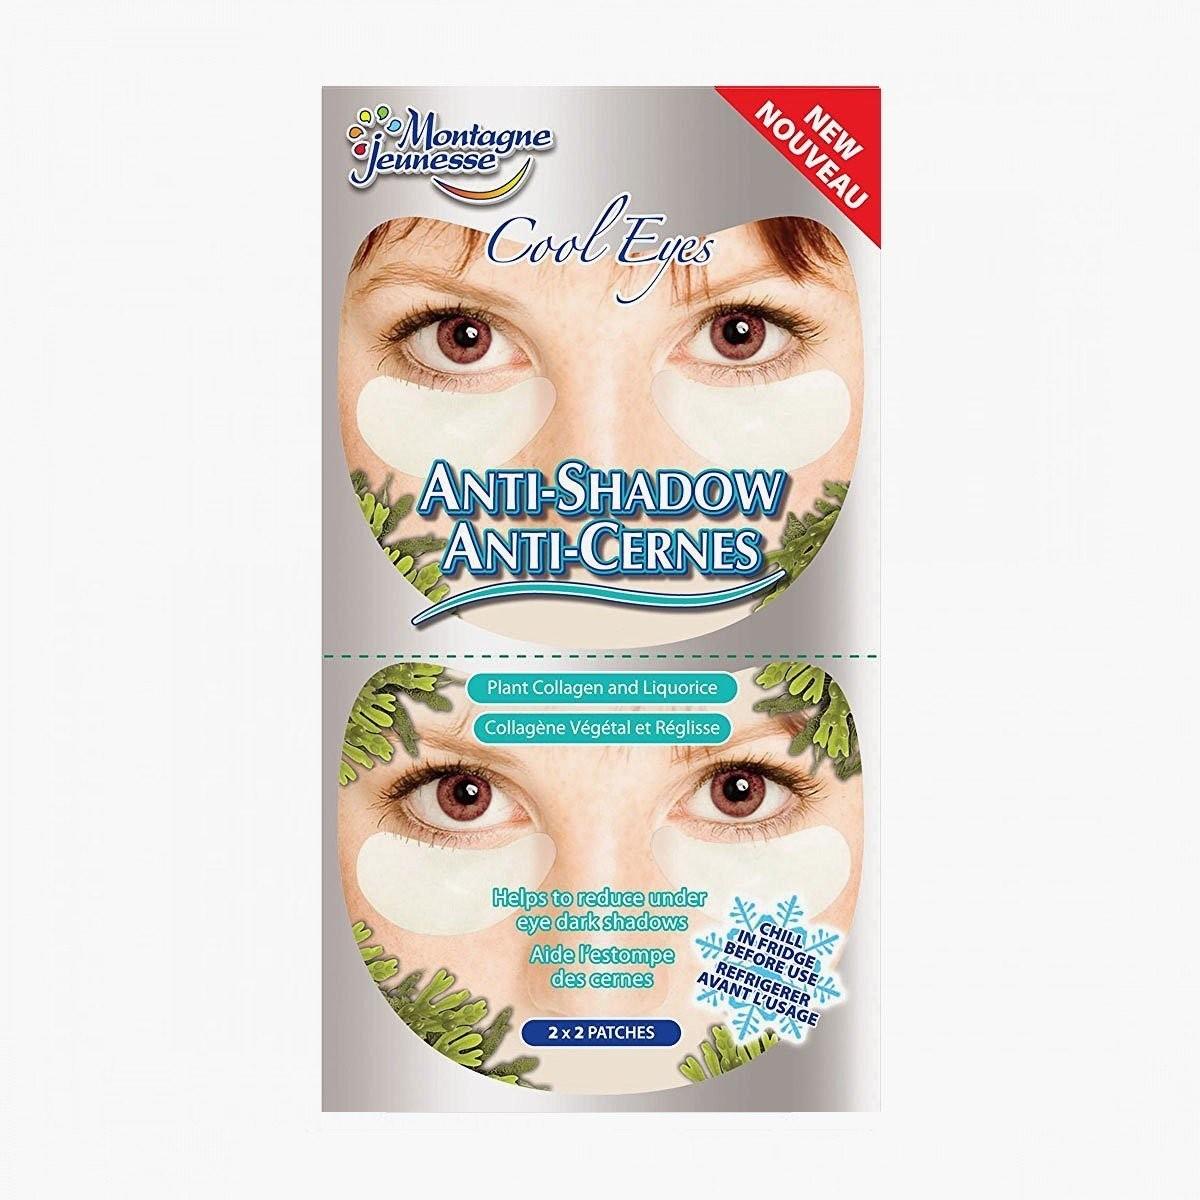 Anti-Shadow Cool Eyes by 7th Heaven